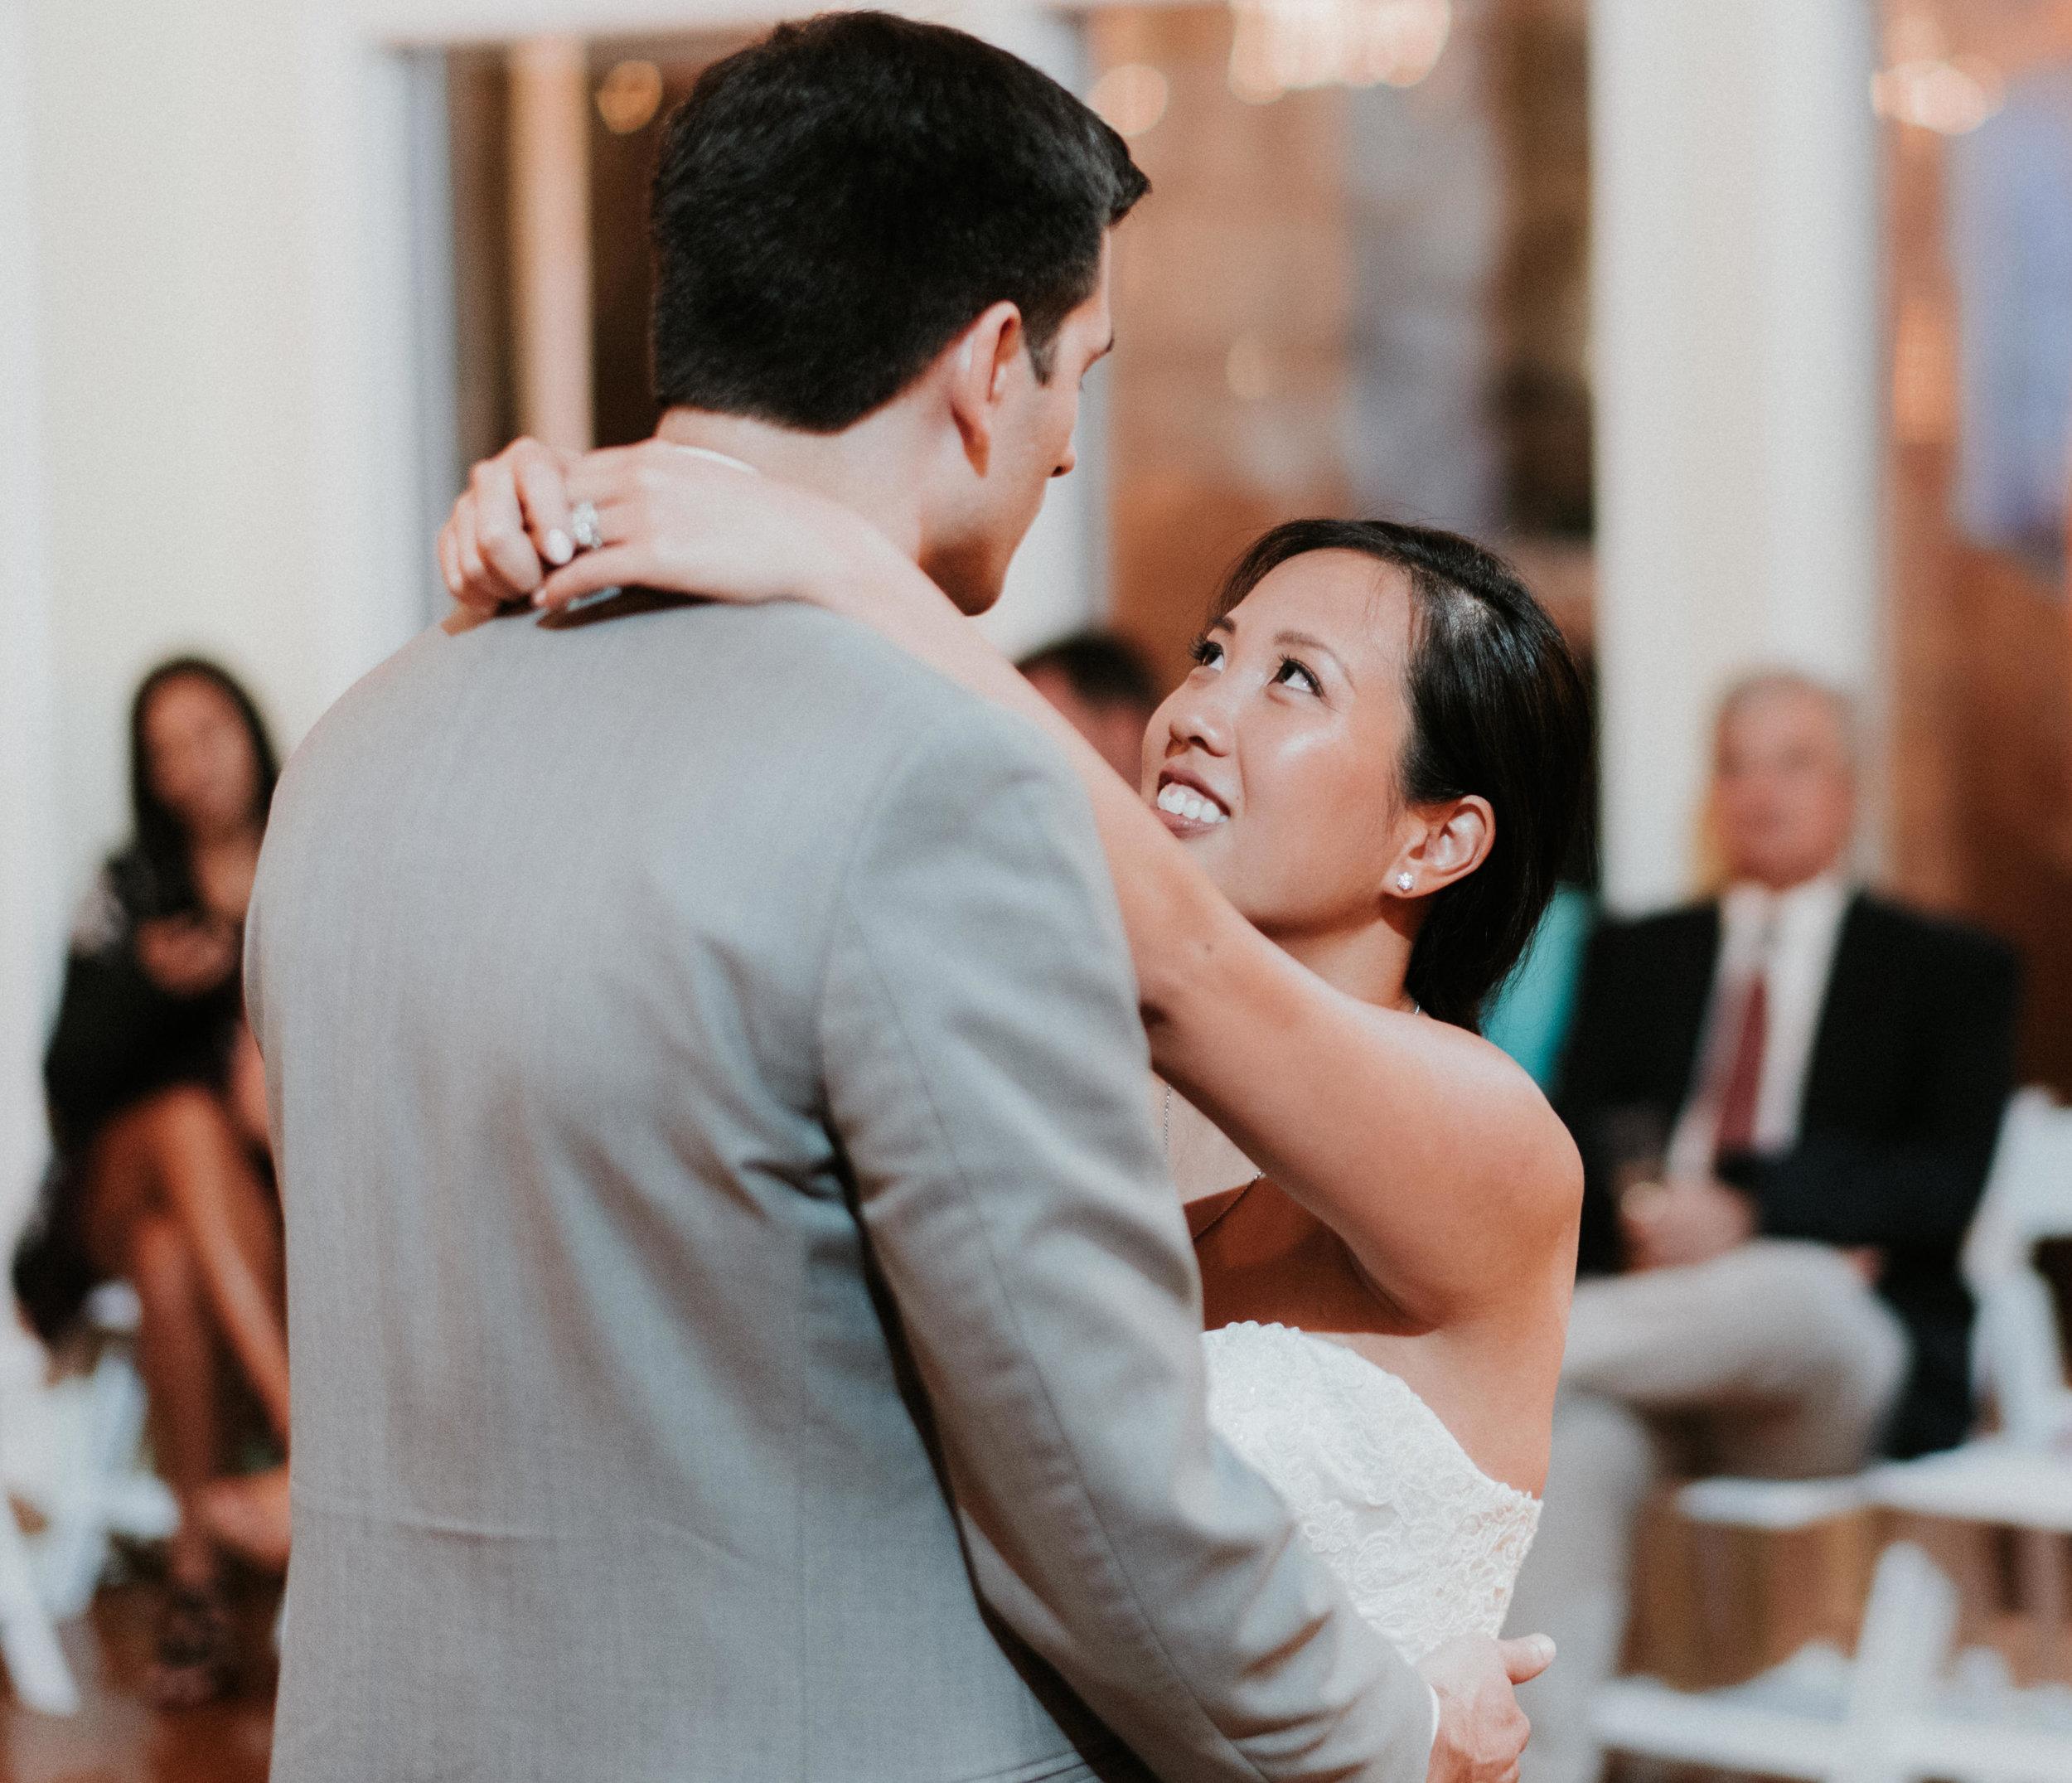 Mr. & Mrs. LeBranche - 197.jpg